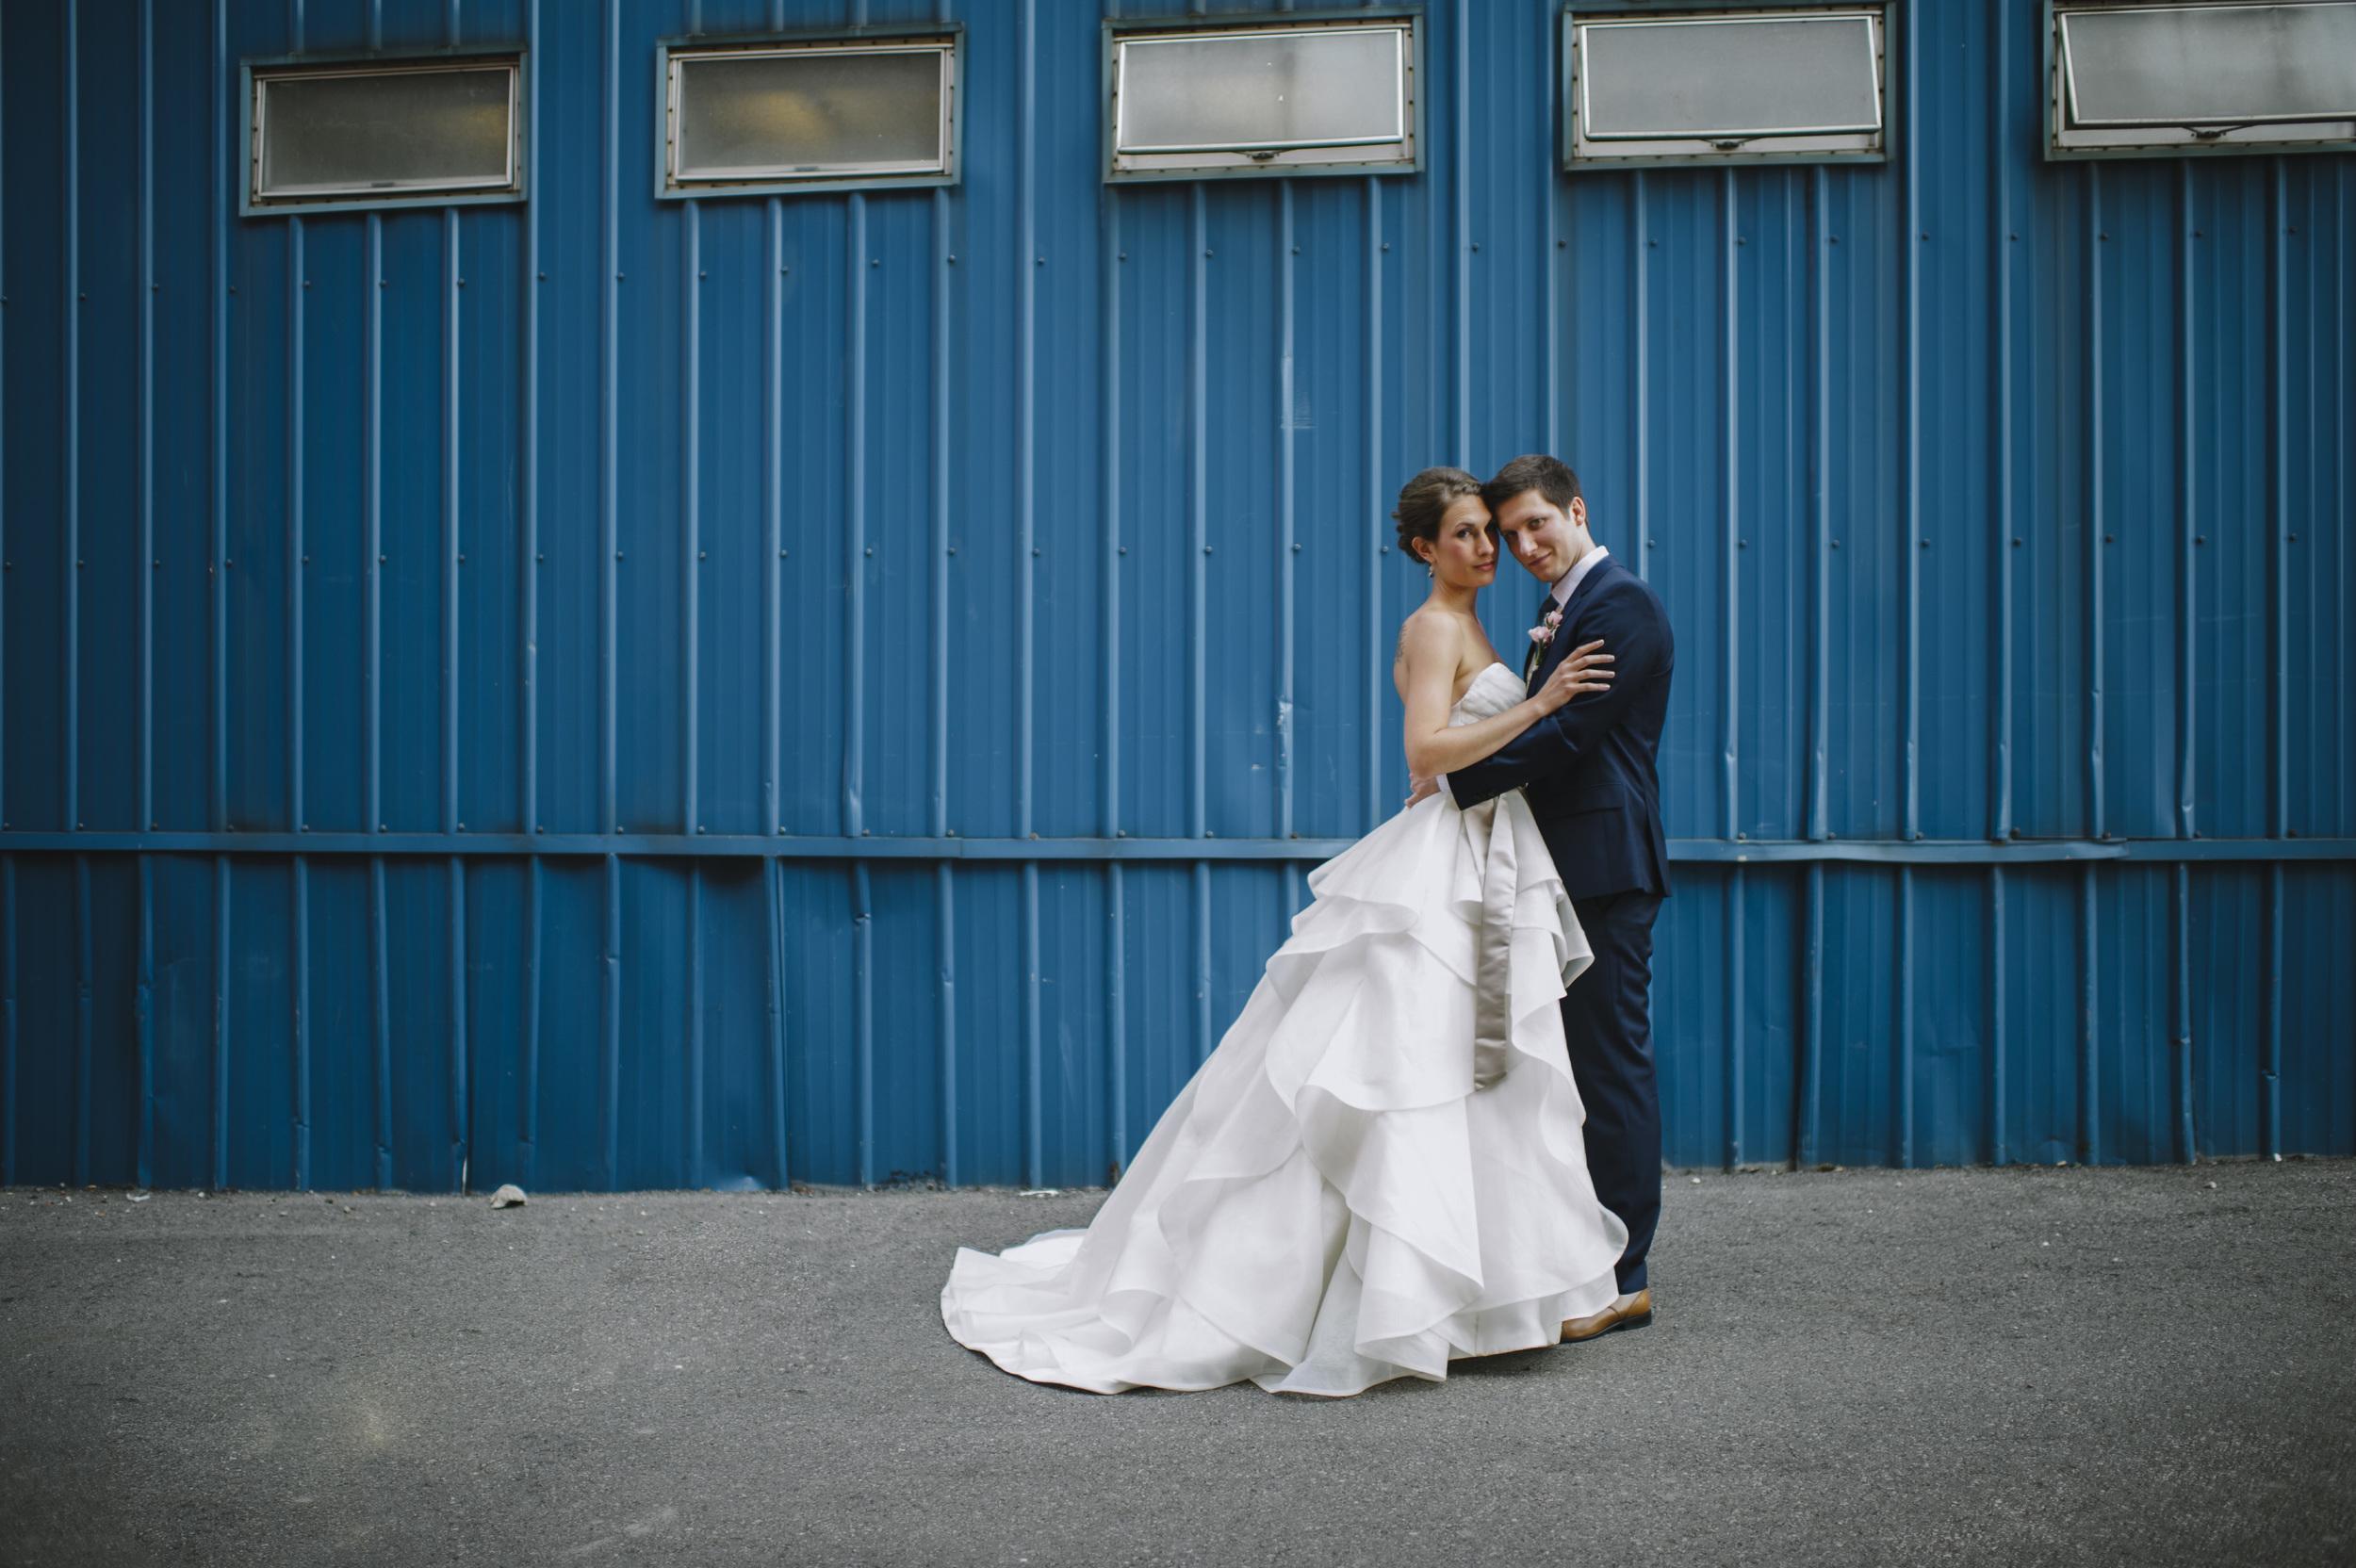 prewedding_55.jpg